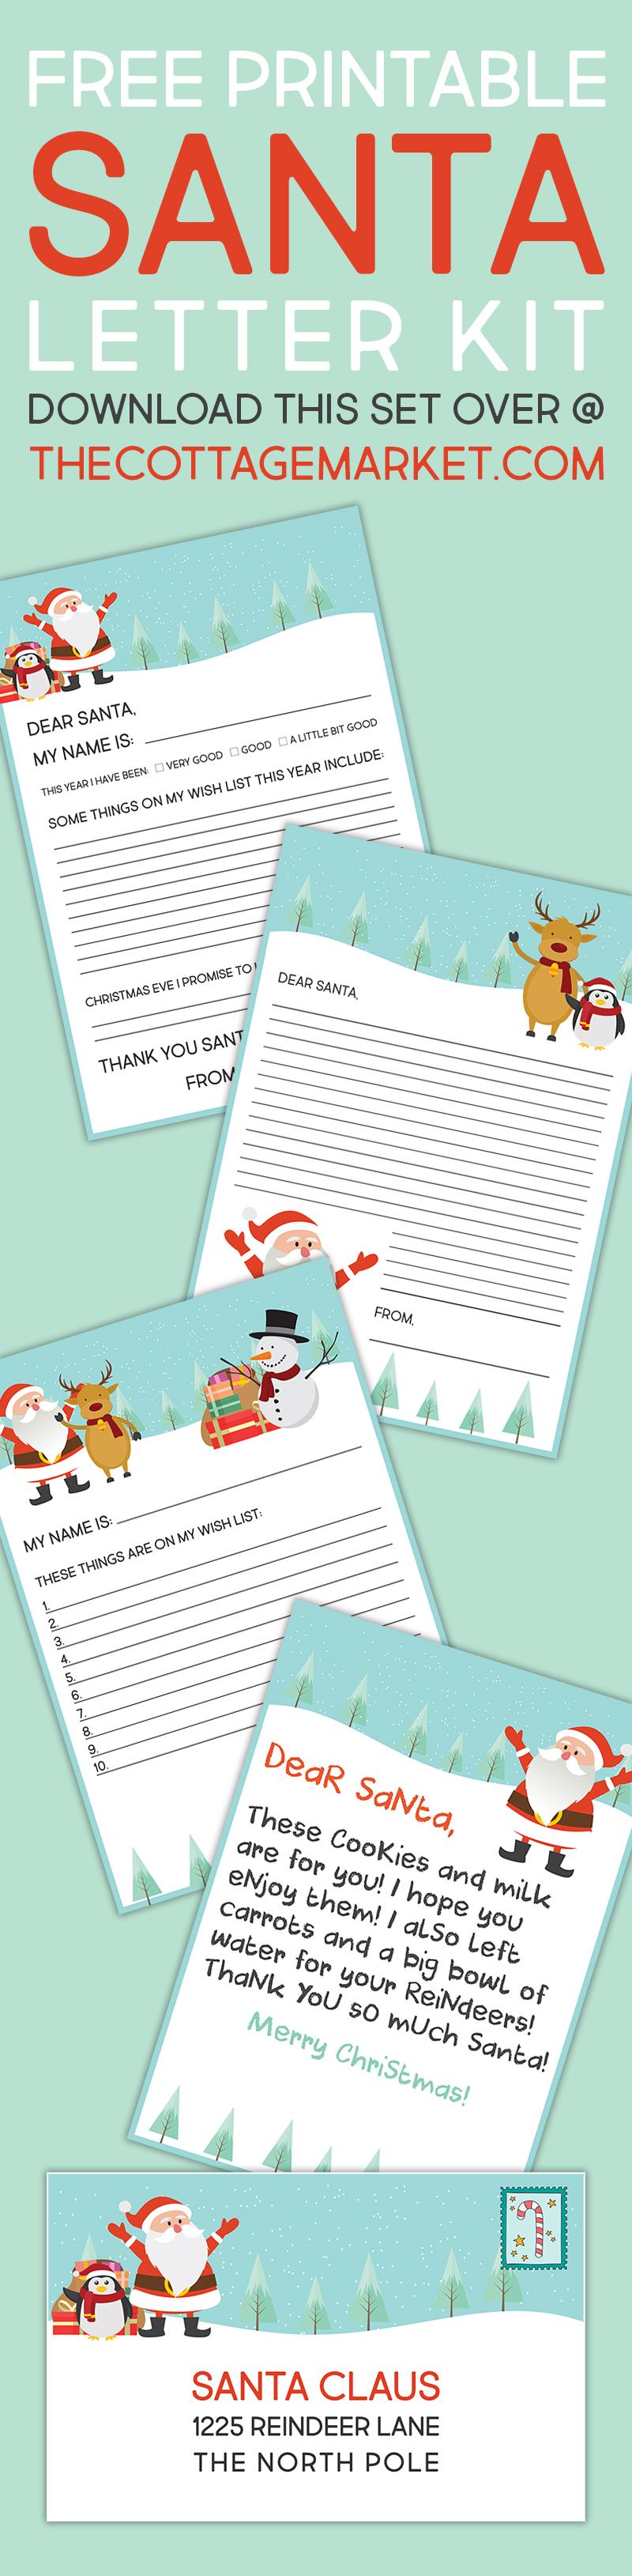 Free printable santa letter kit the cottage market tcm dearsantakit letter tower 1 spiritdancerdesigns Images